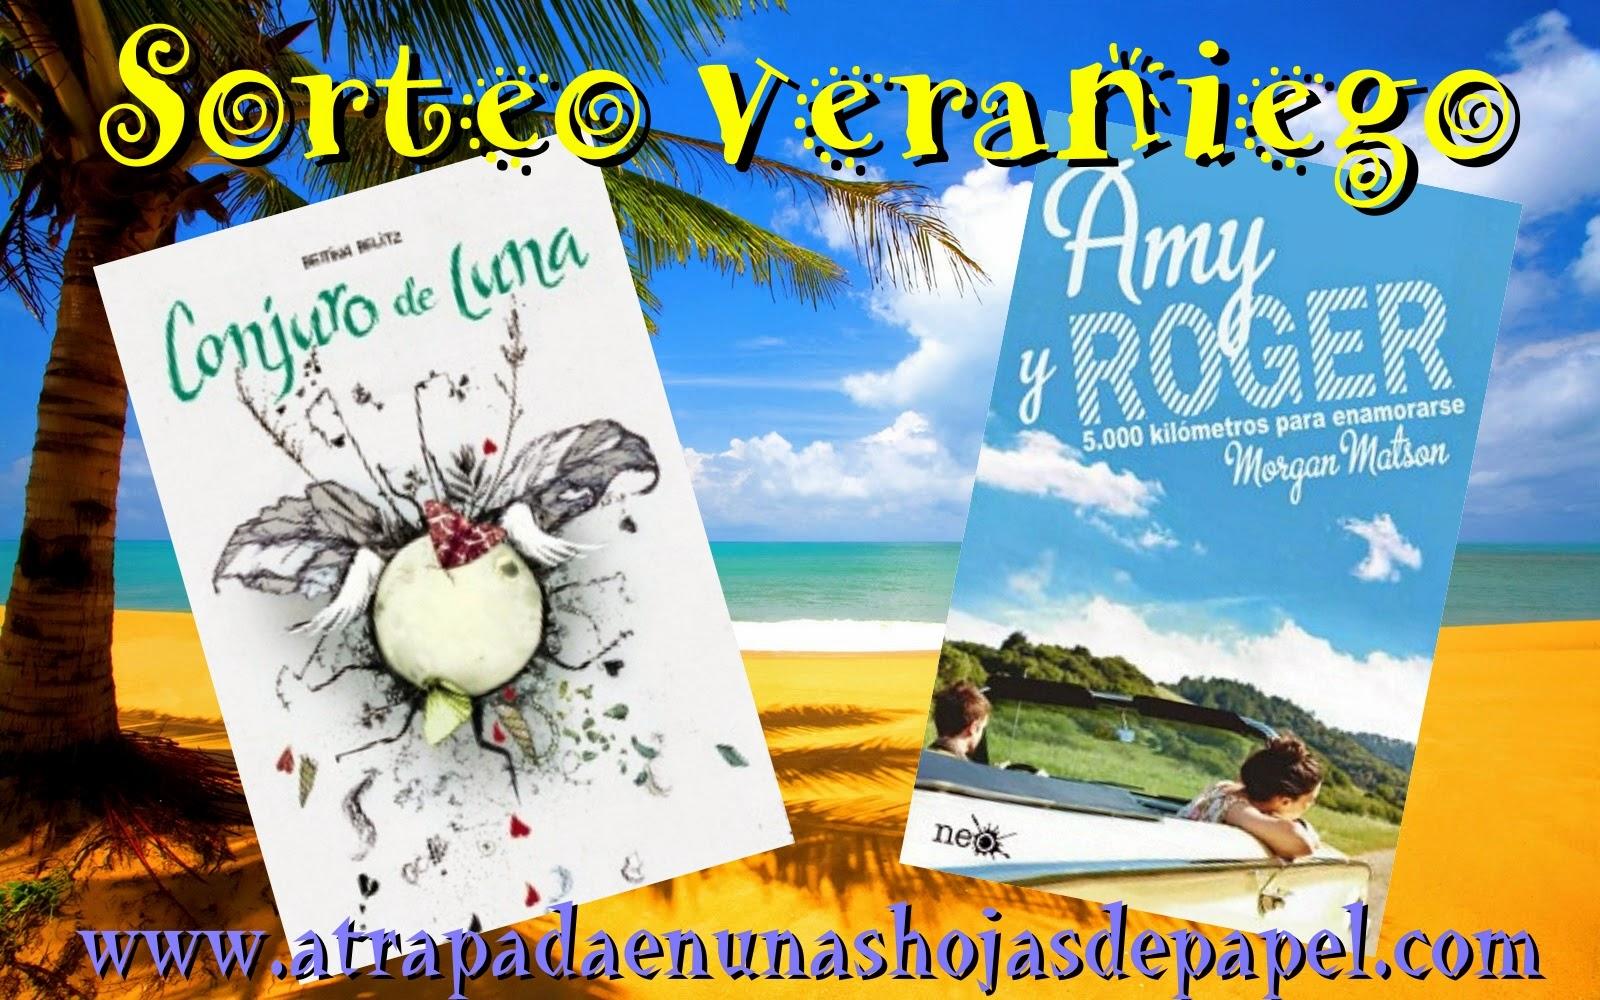 http://www.atrapadaenunashojasdepapel.com/2014/07/sorteo-veraniego.html